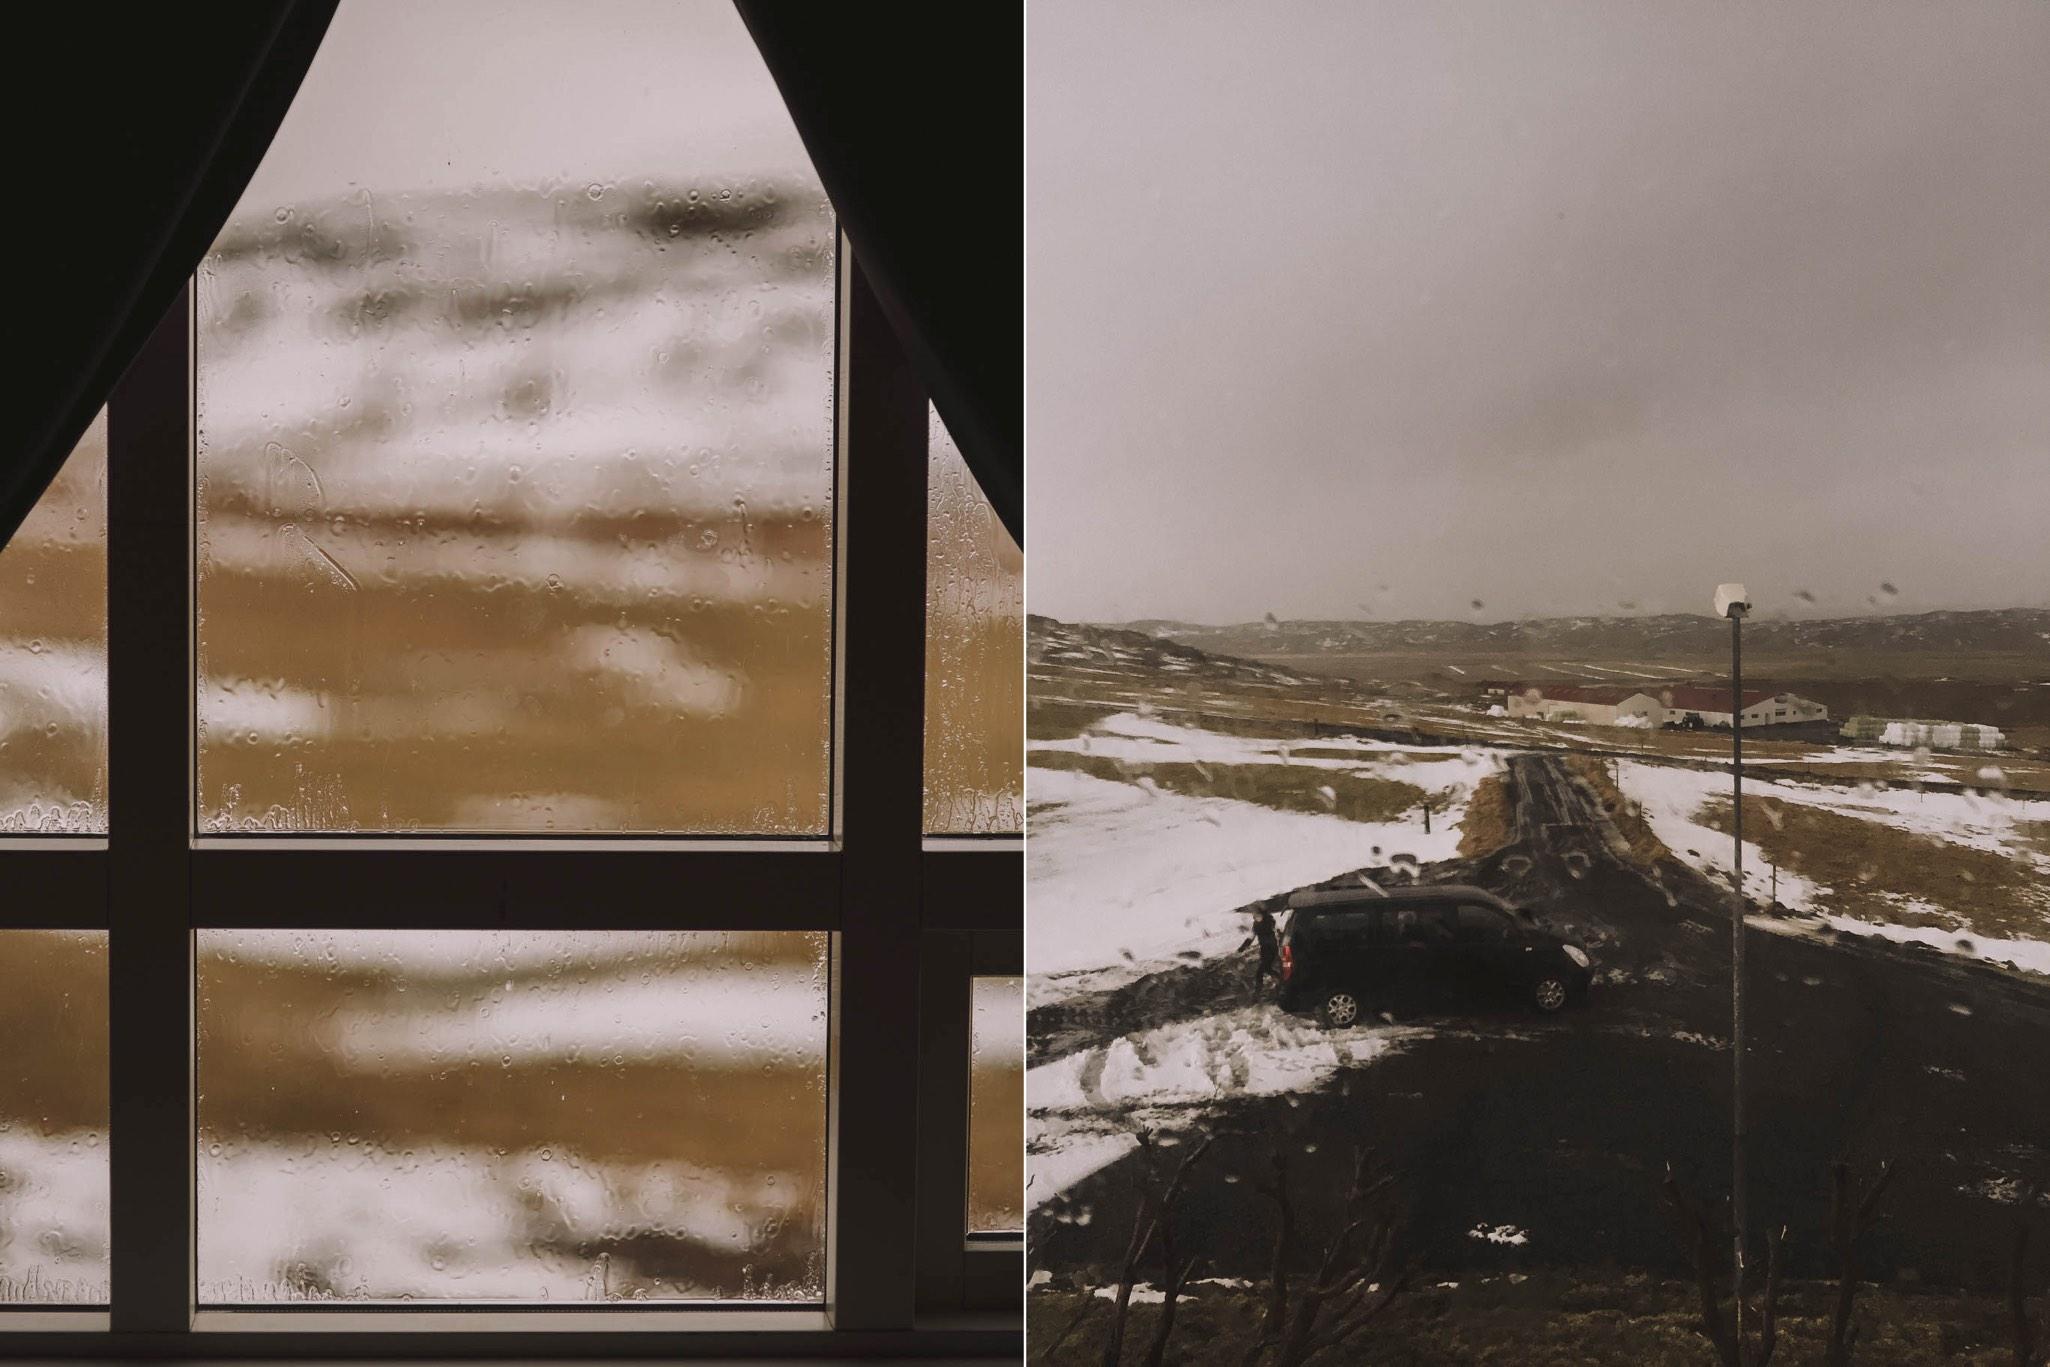 Road-trip-Islande-Iceland-Voyage-Travel-Portrait-Jérémy-Boyer-mountain-montagne-snow-storm-tempete-neige-6.jpg